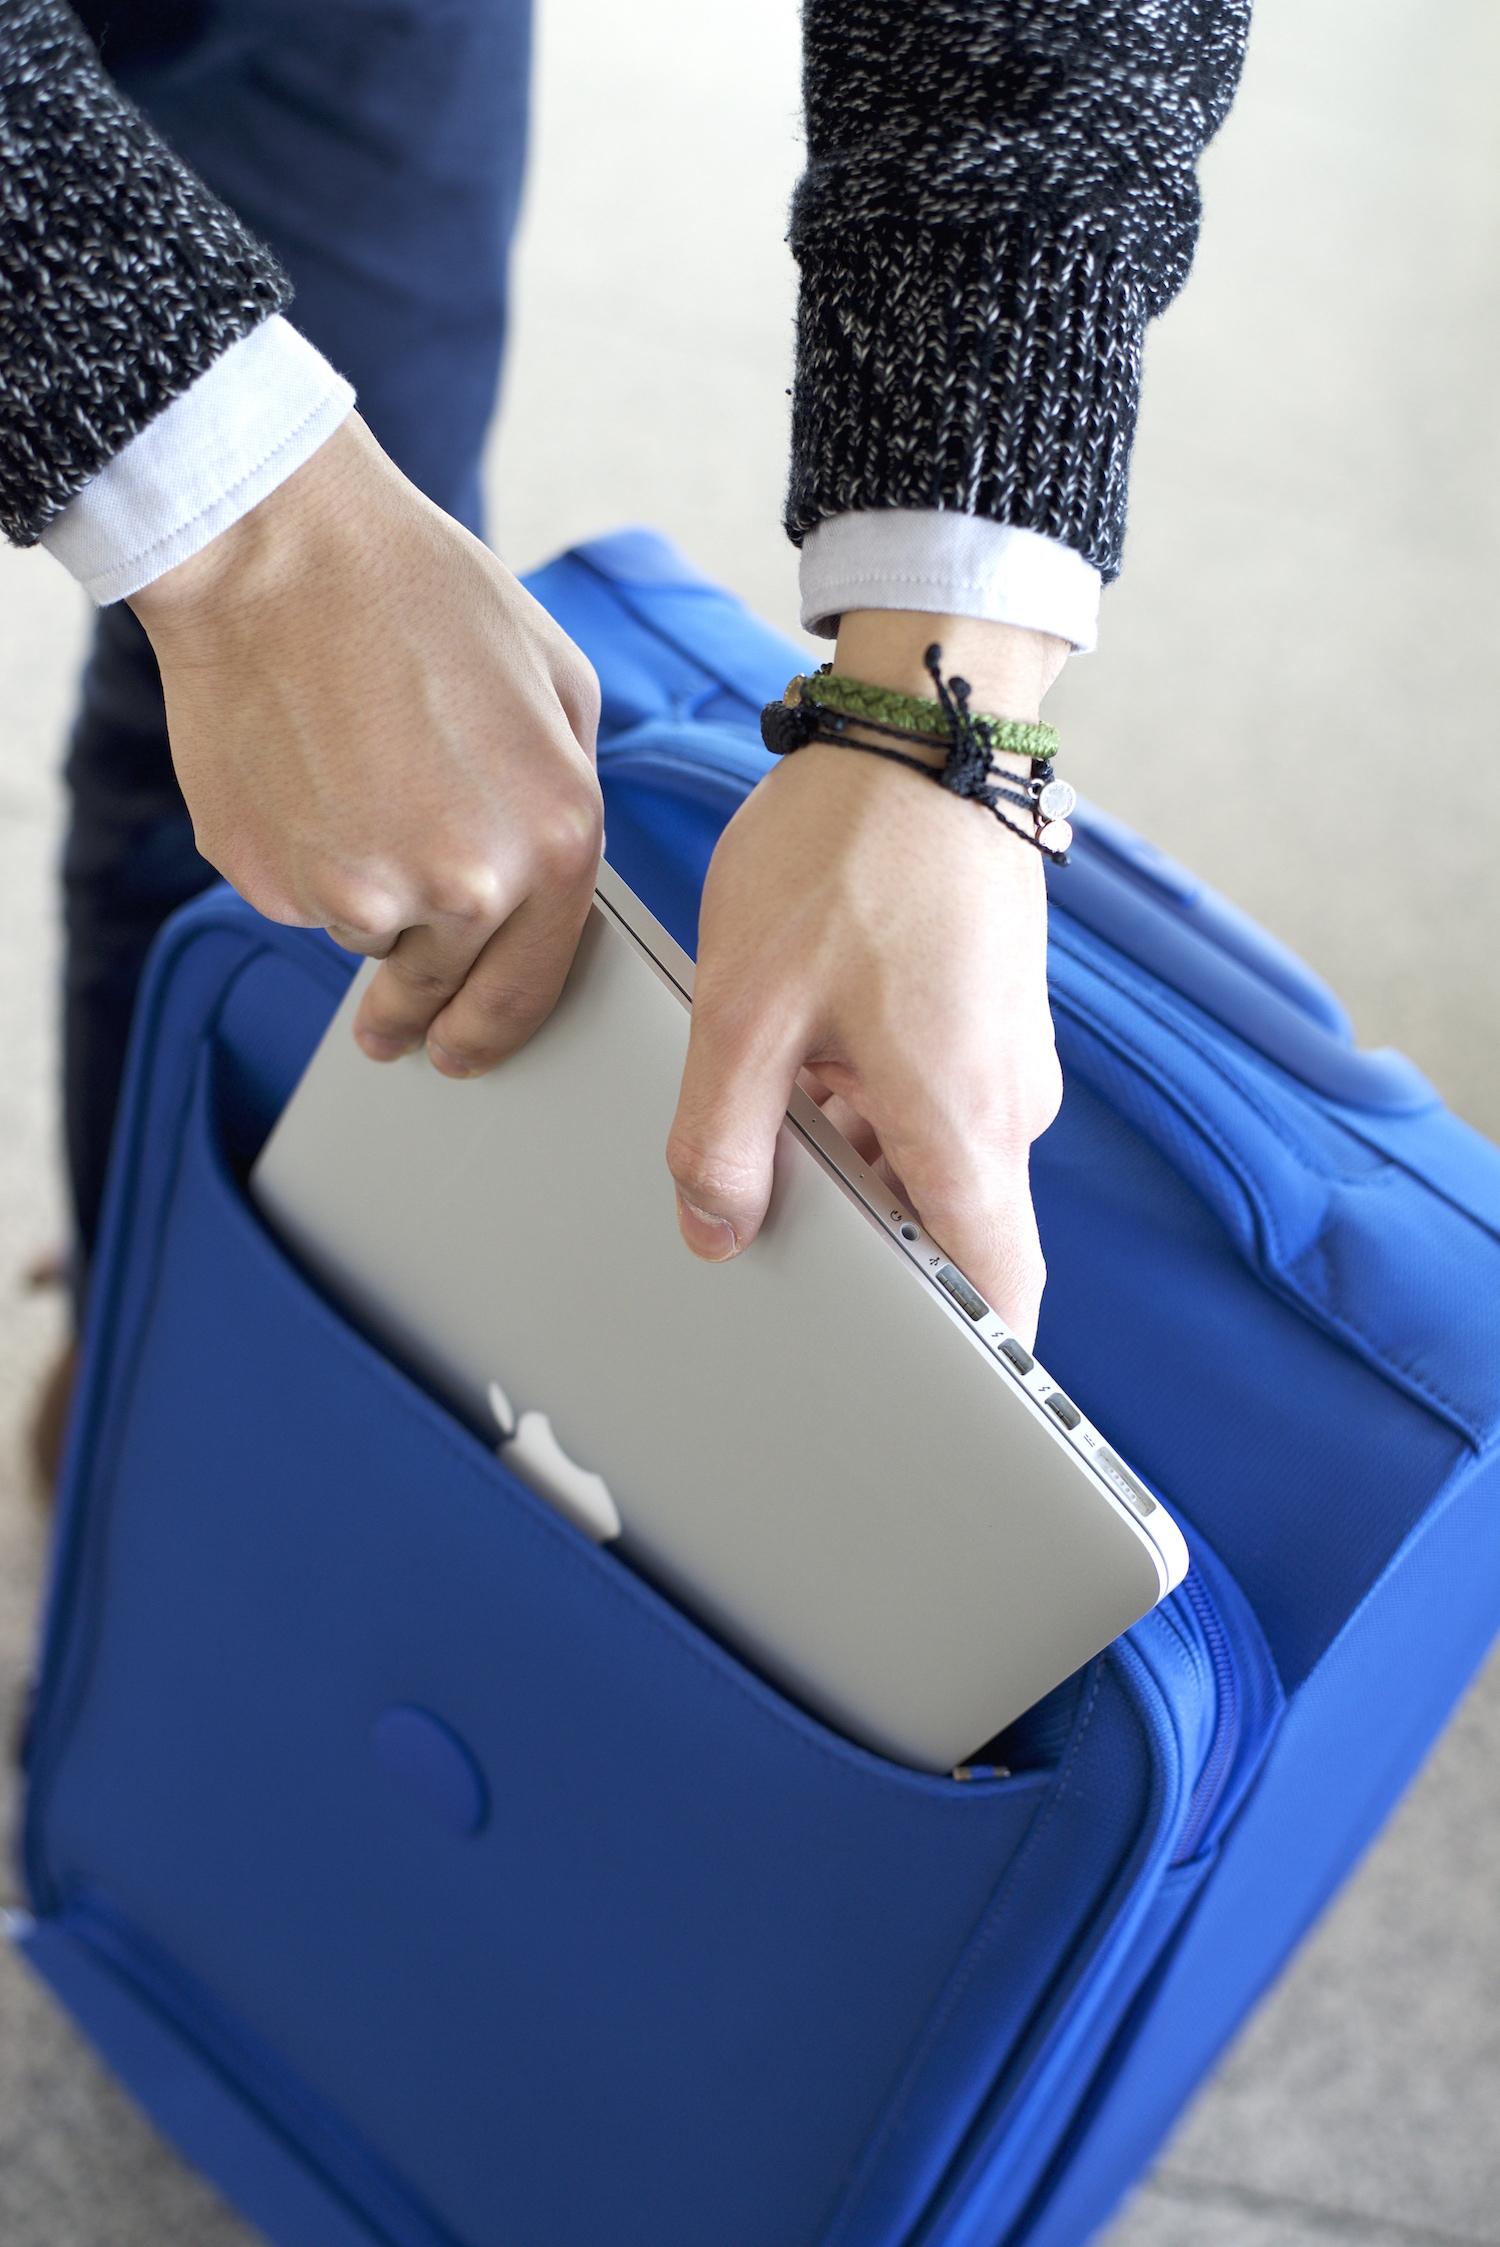 Delsey Chatillon laptop compartment